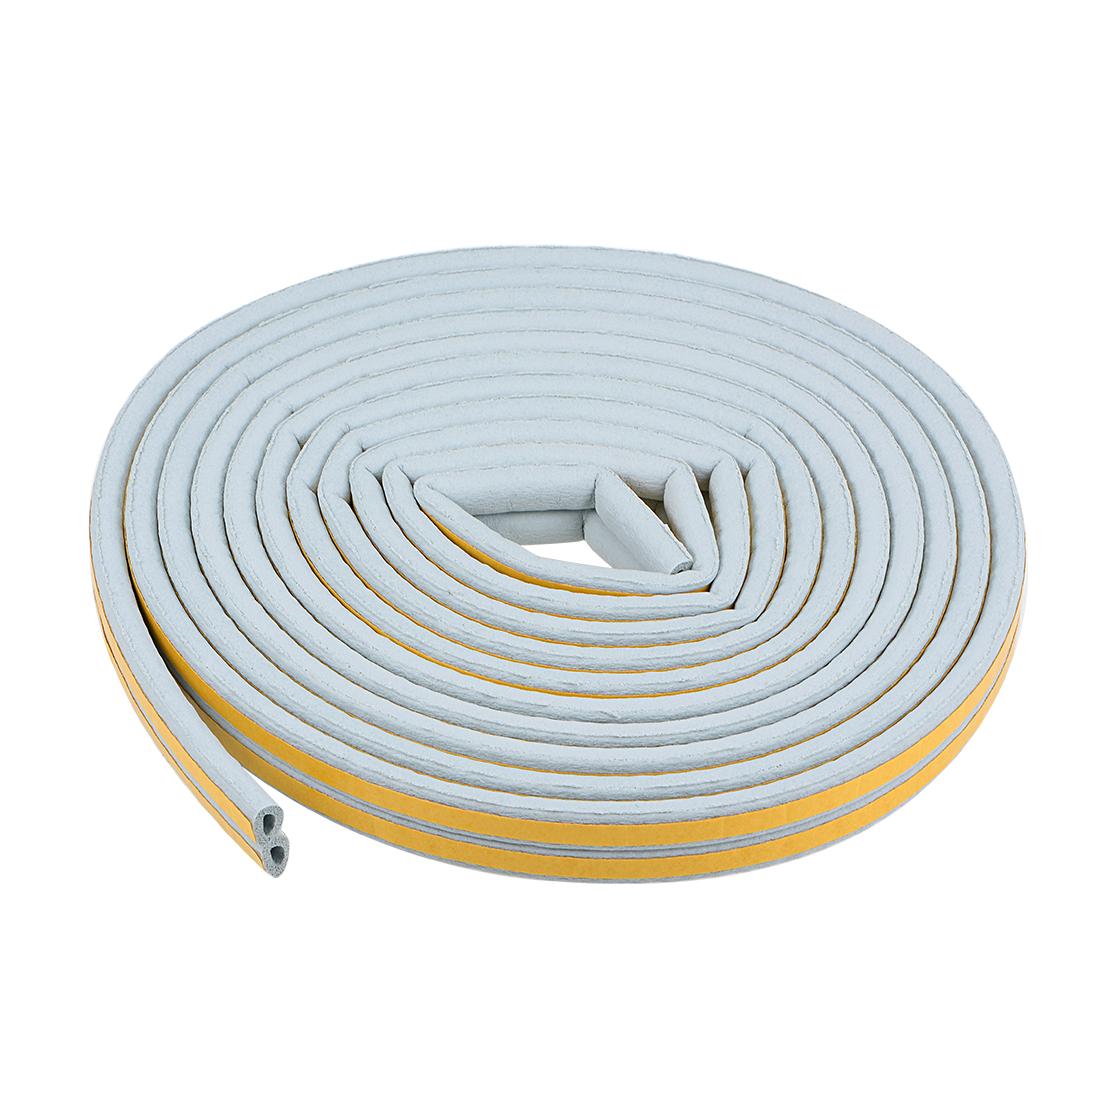 Foam Tape Self-Adhesive 9mm Width 6mm Thick, Total 26 Feet Gray 2Pcs